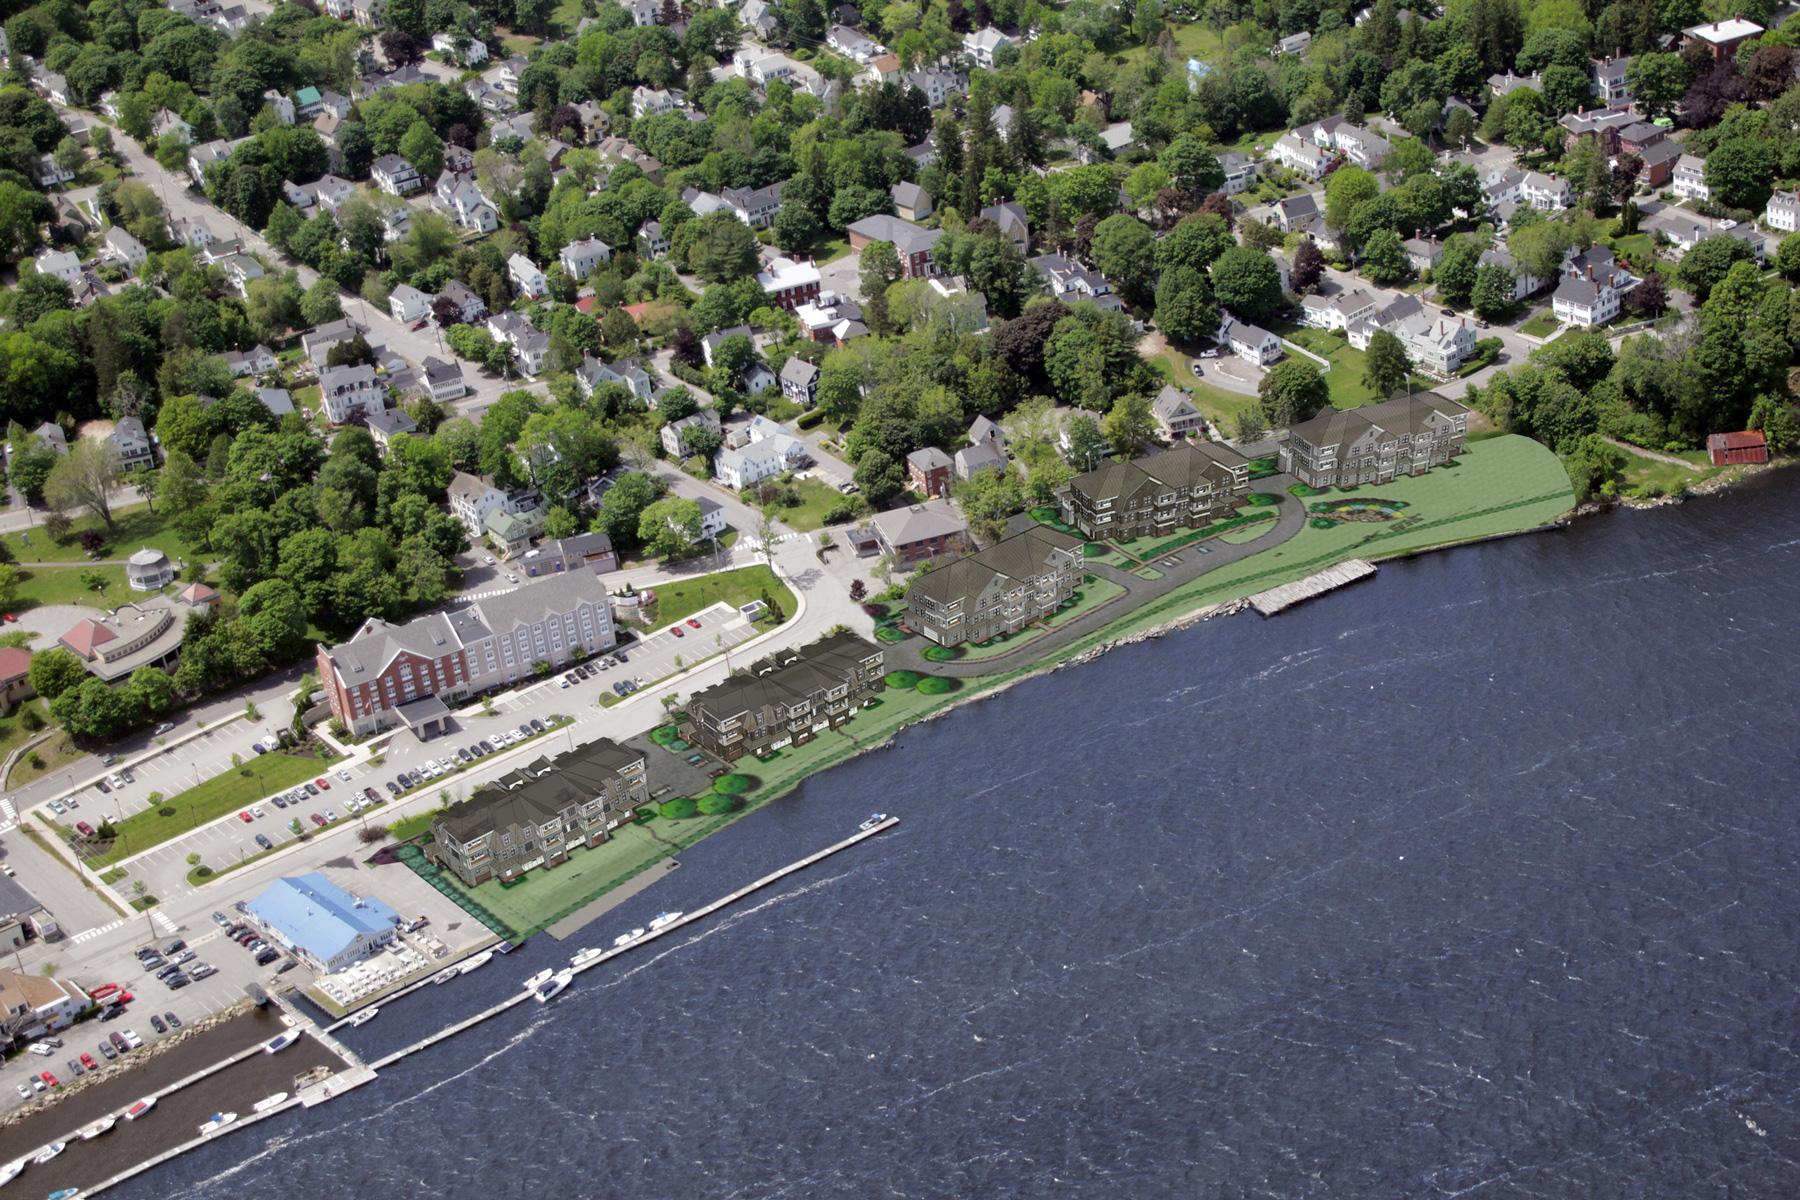 Condominium for Sale at 145 Commercial Street, # 203 Bath, Maine 04530 United States